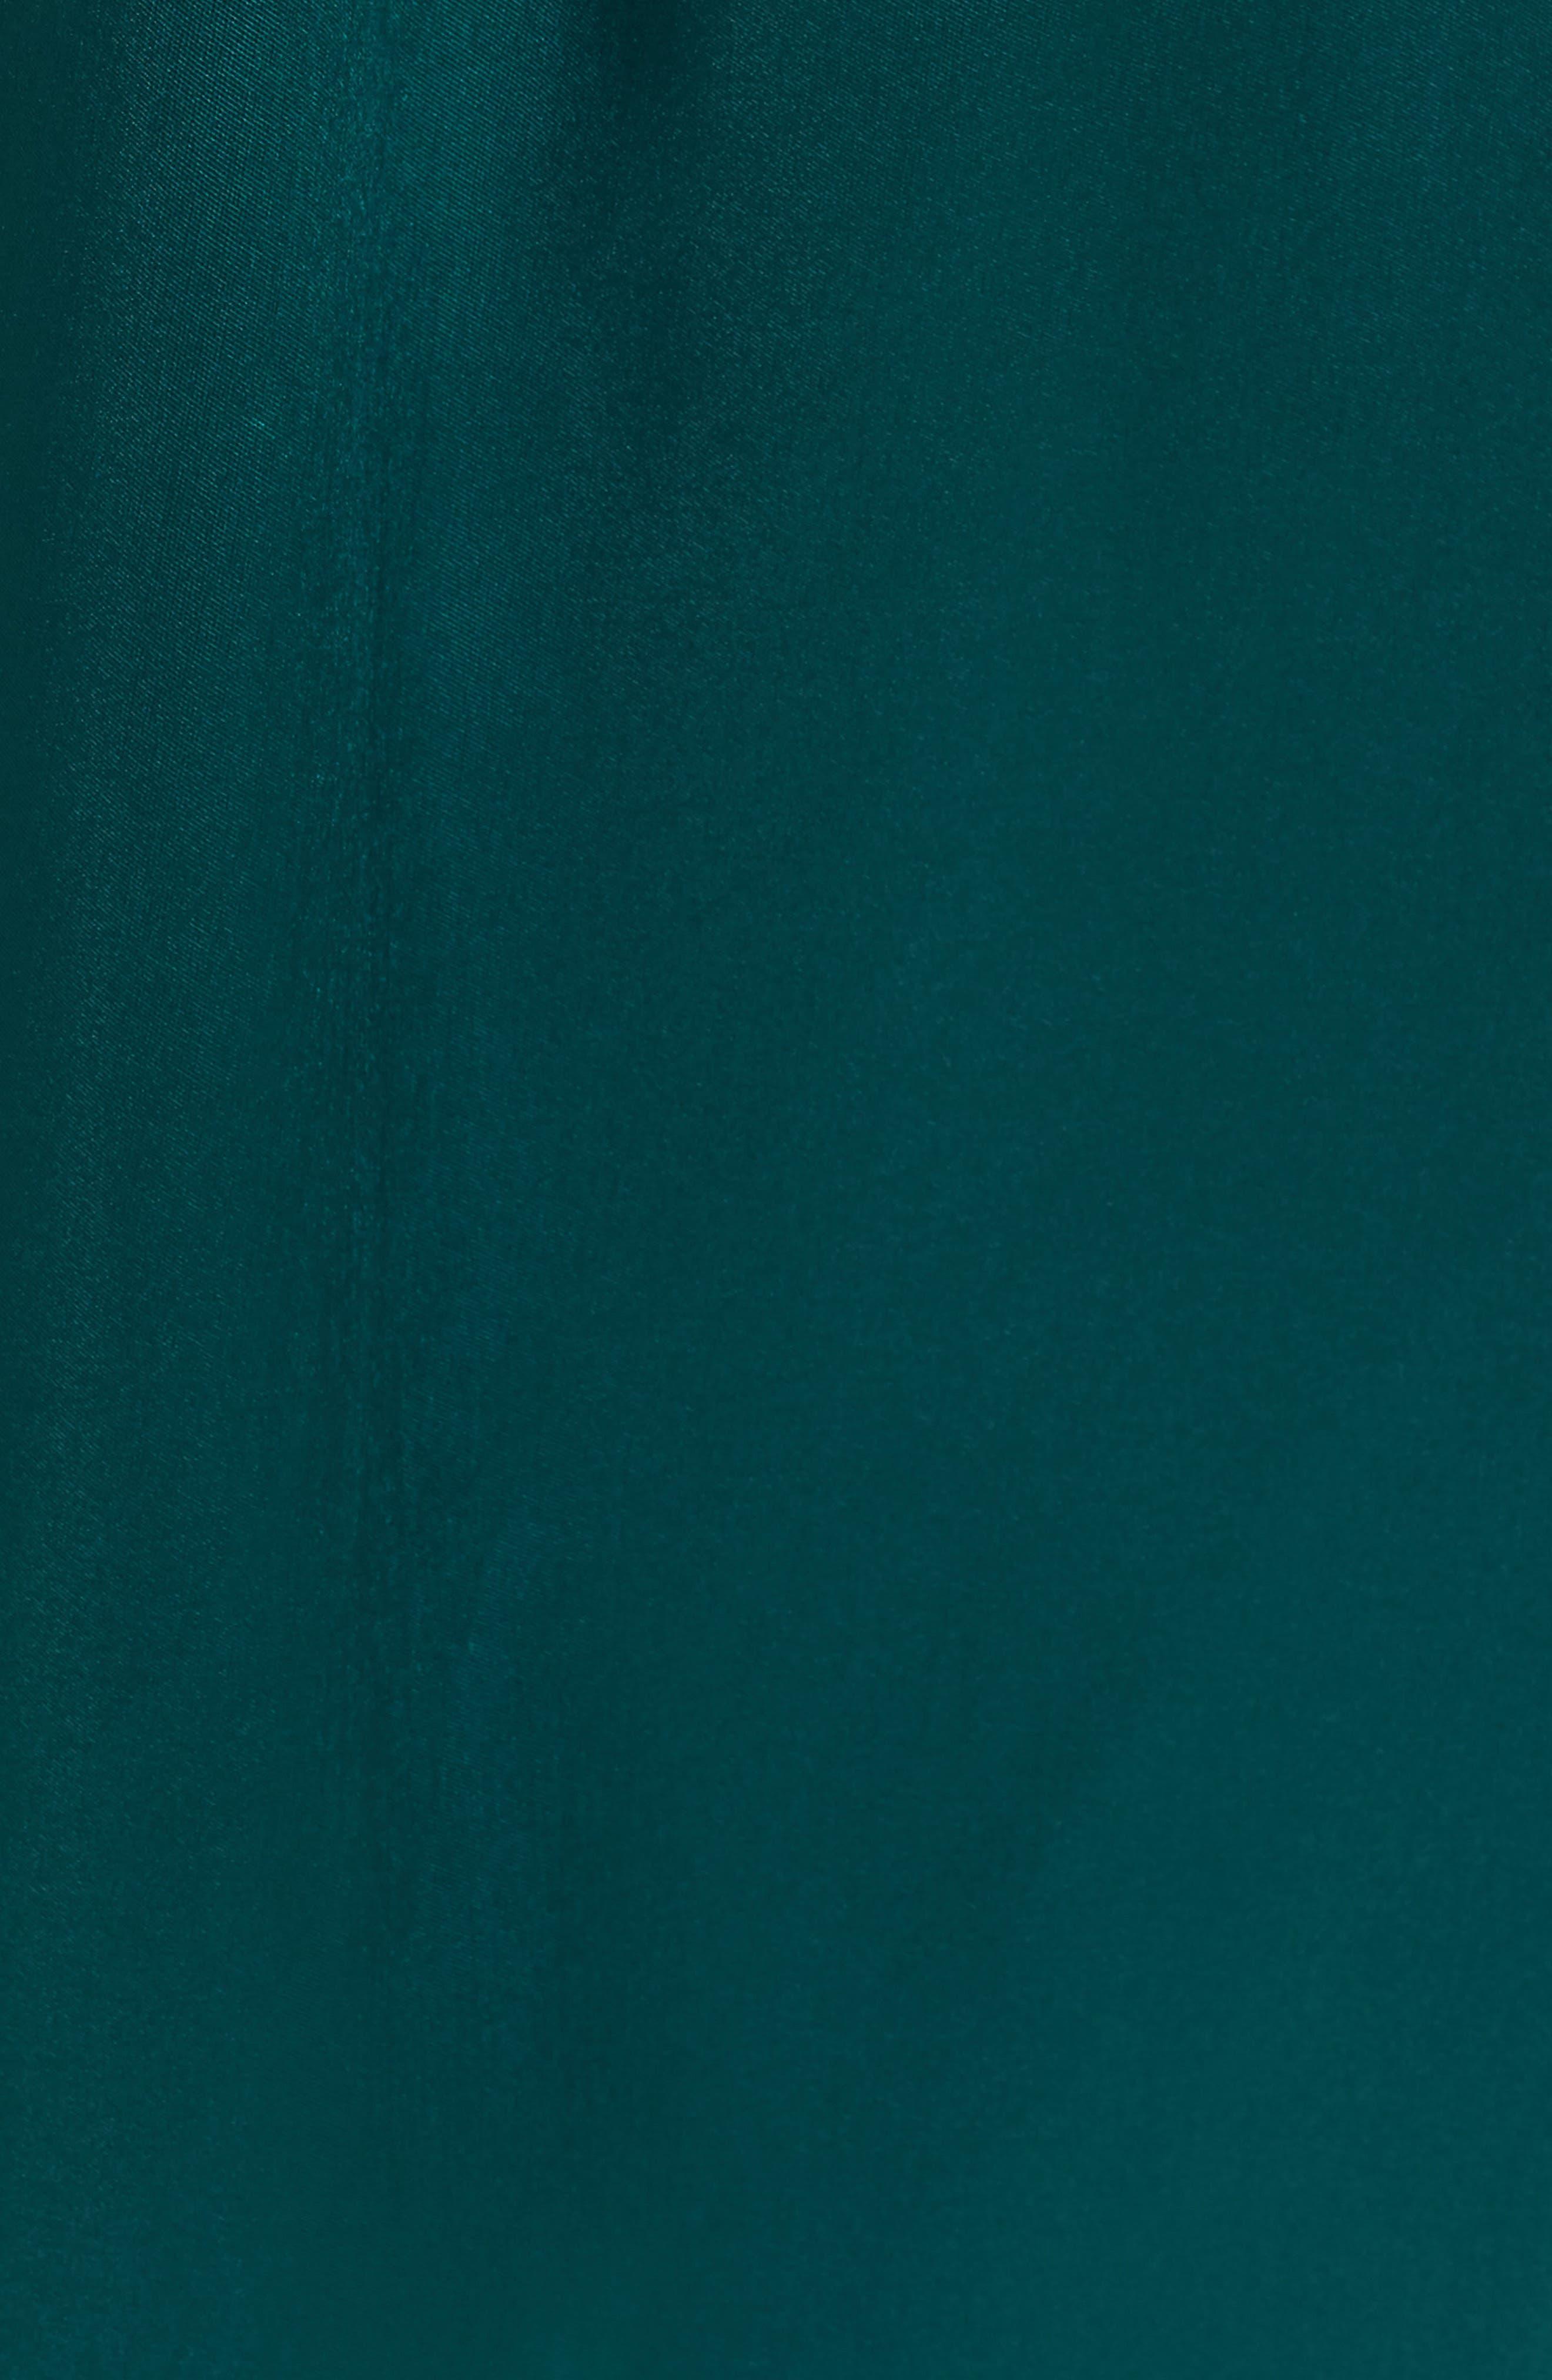 Off the Shoulder Ballgown,                             Alternate thumbnail 5, color,                             Emerald